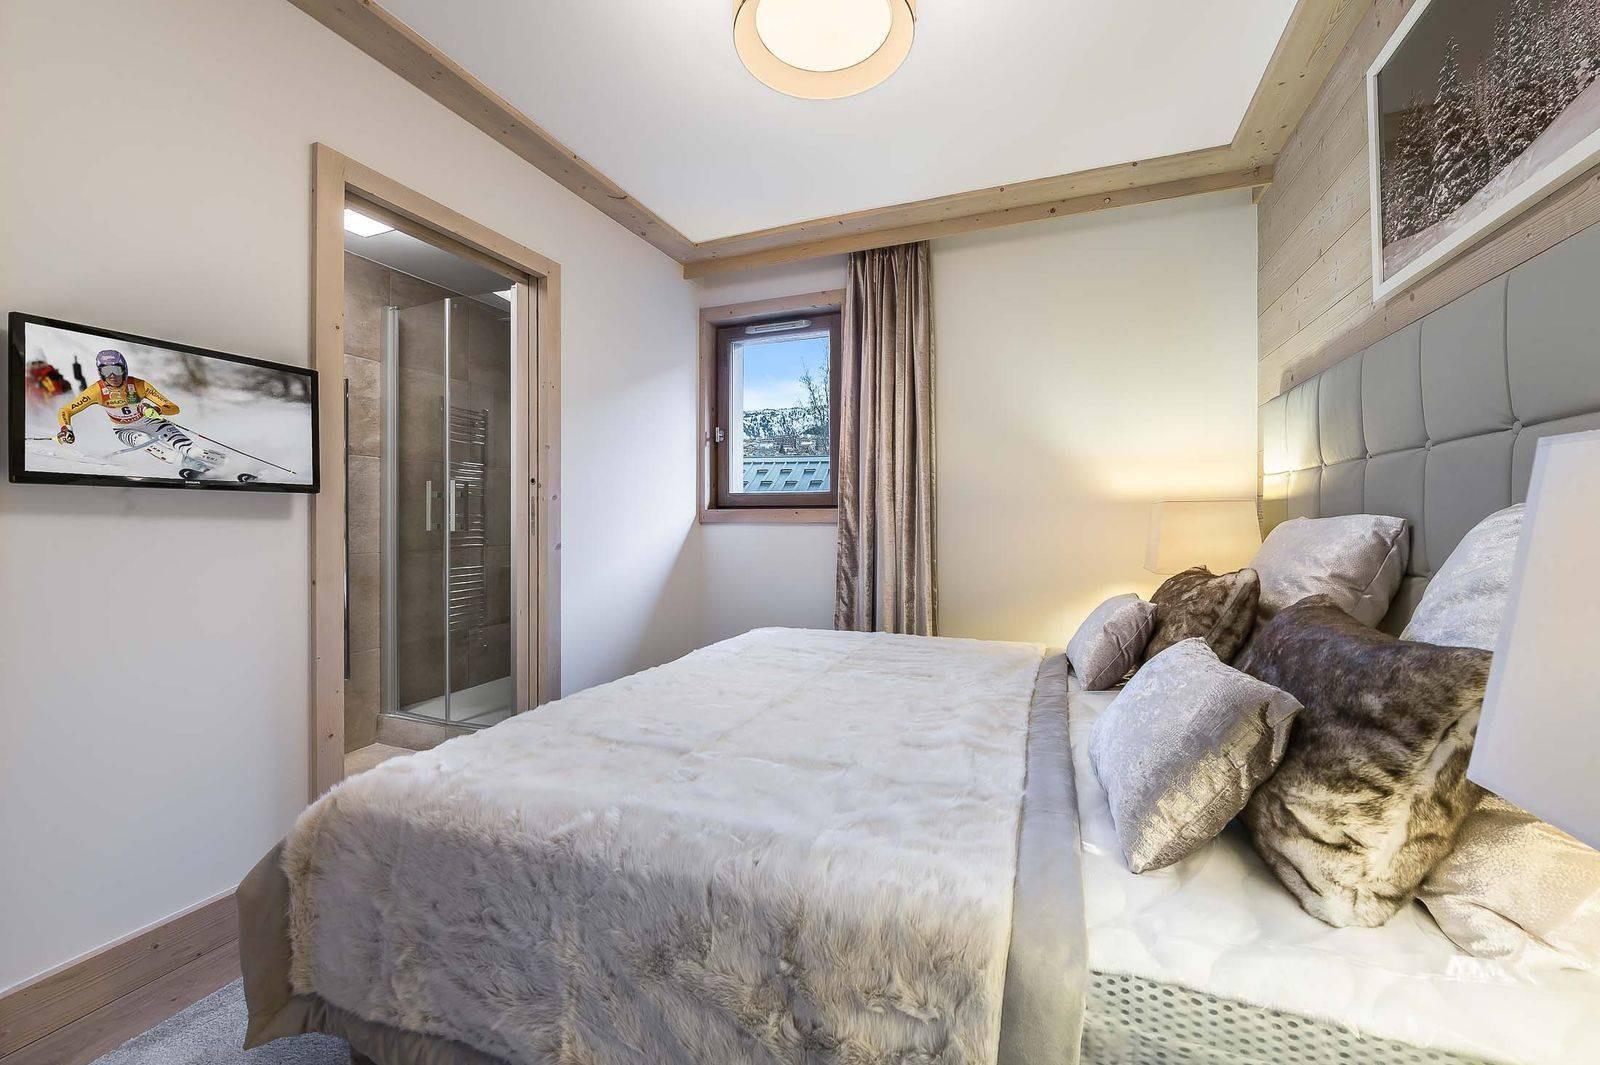 Courchevel 1550 Location Appartement Luxe Telumite Chambre 3